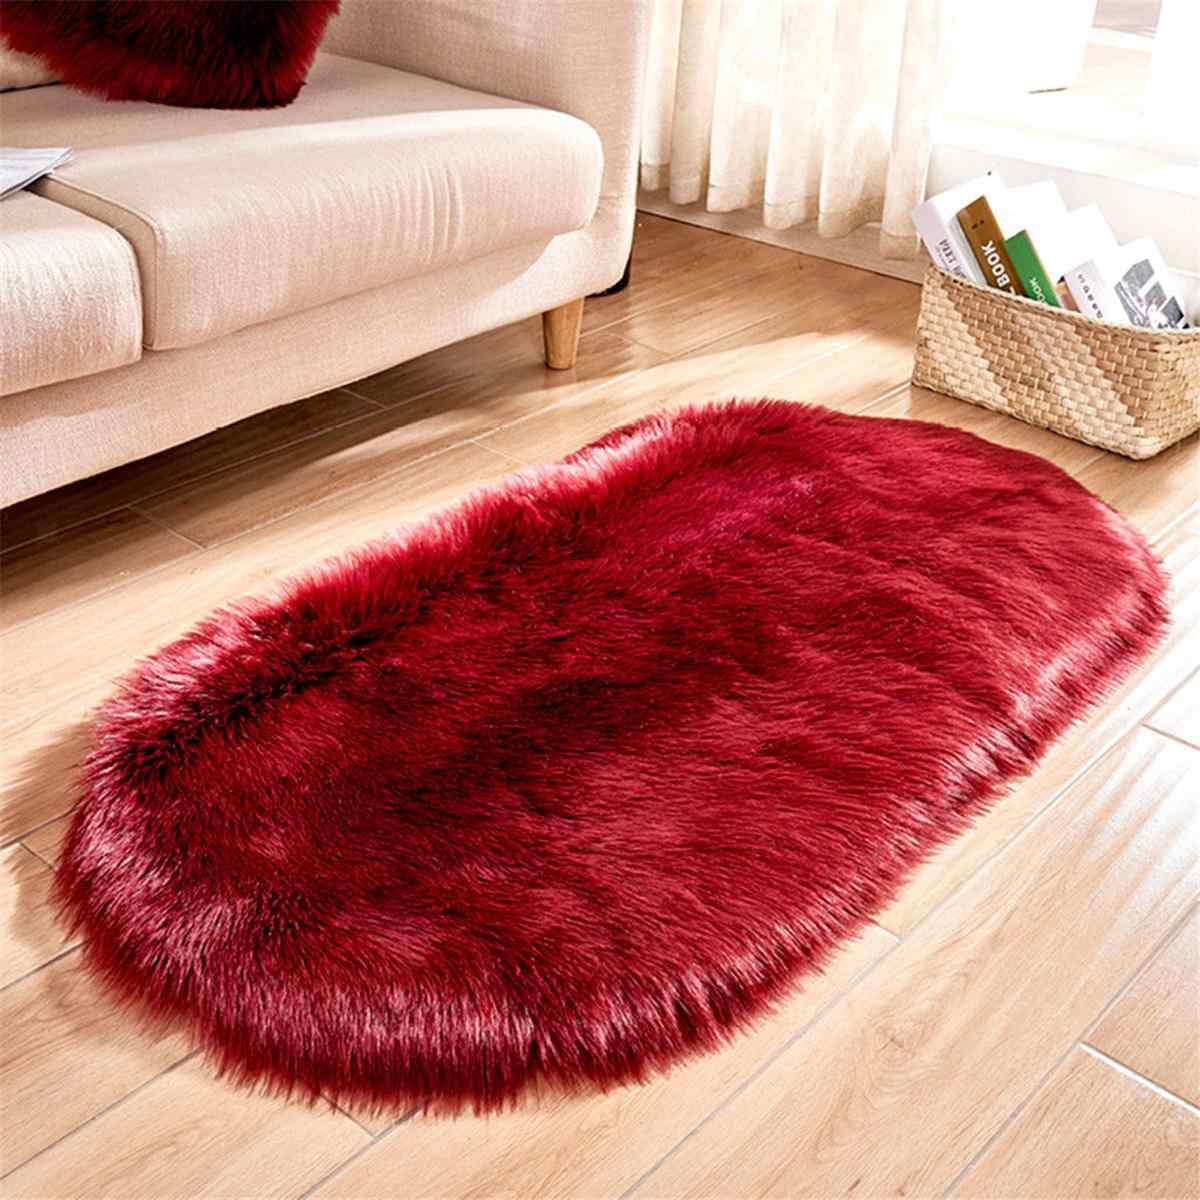 Oval Plush Area Rug Living Room Carpet Nonslip Home Hotel